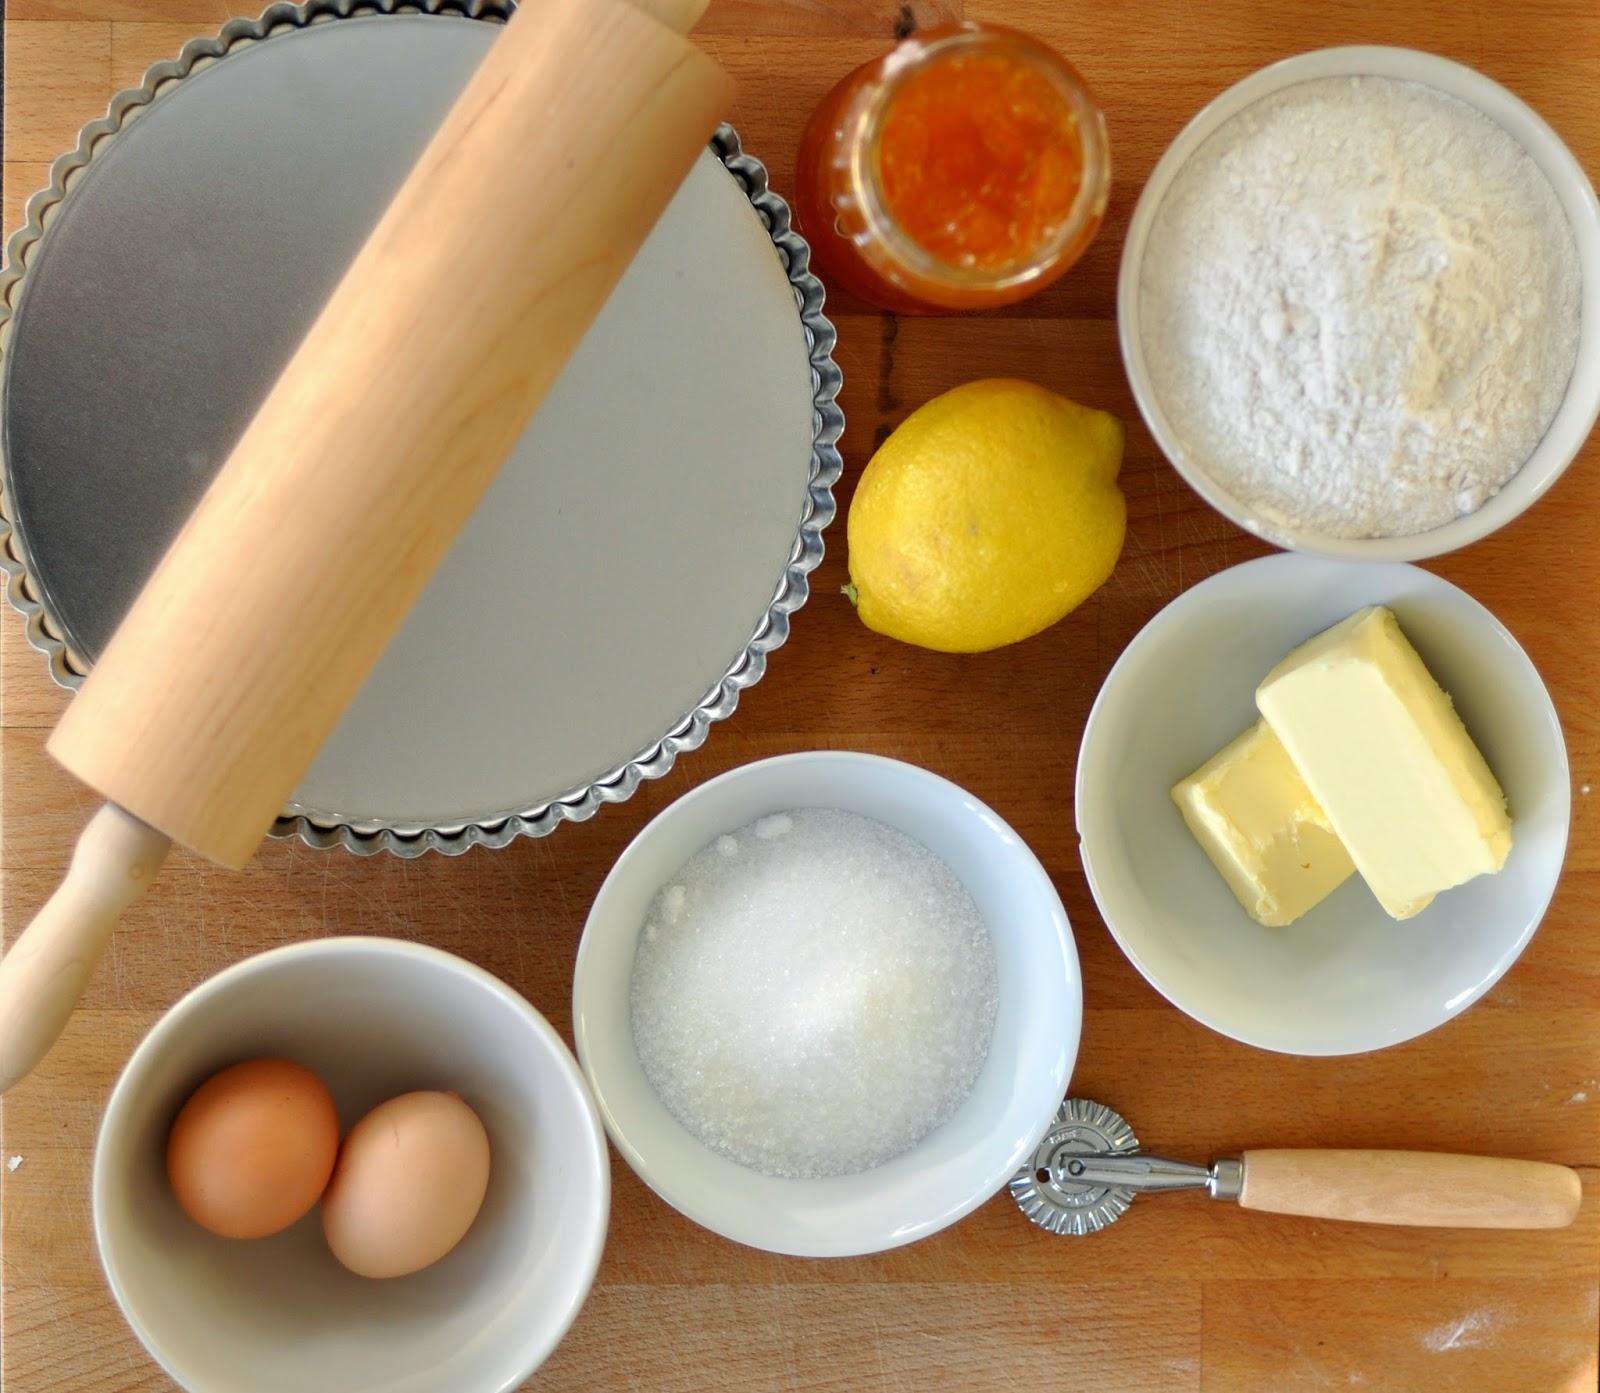 Crostata ingrediënten